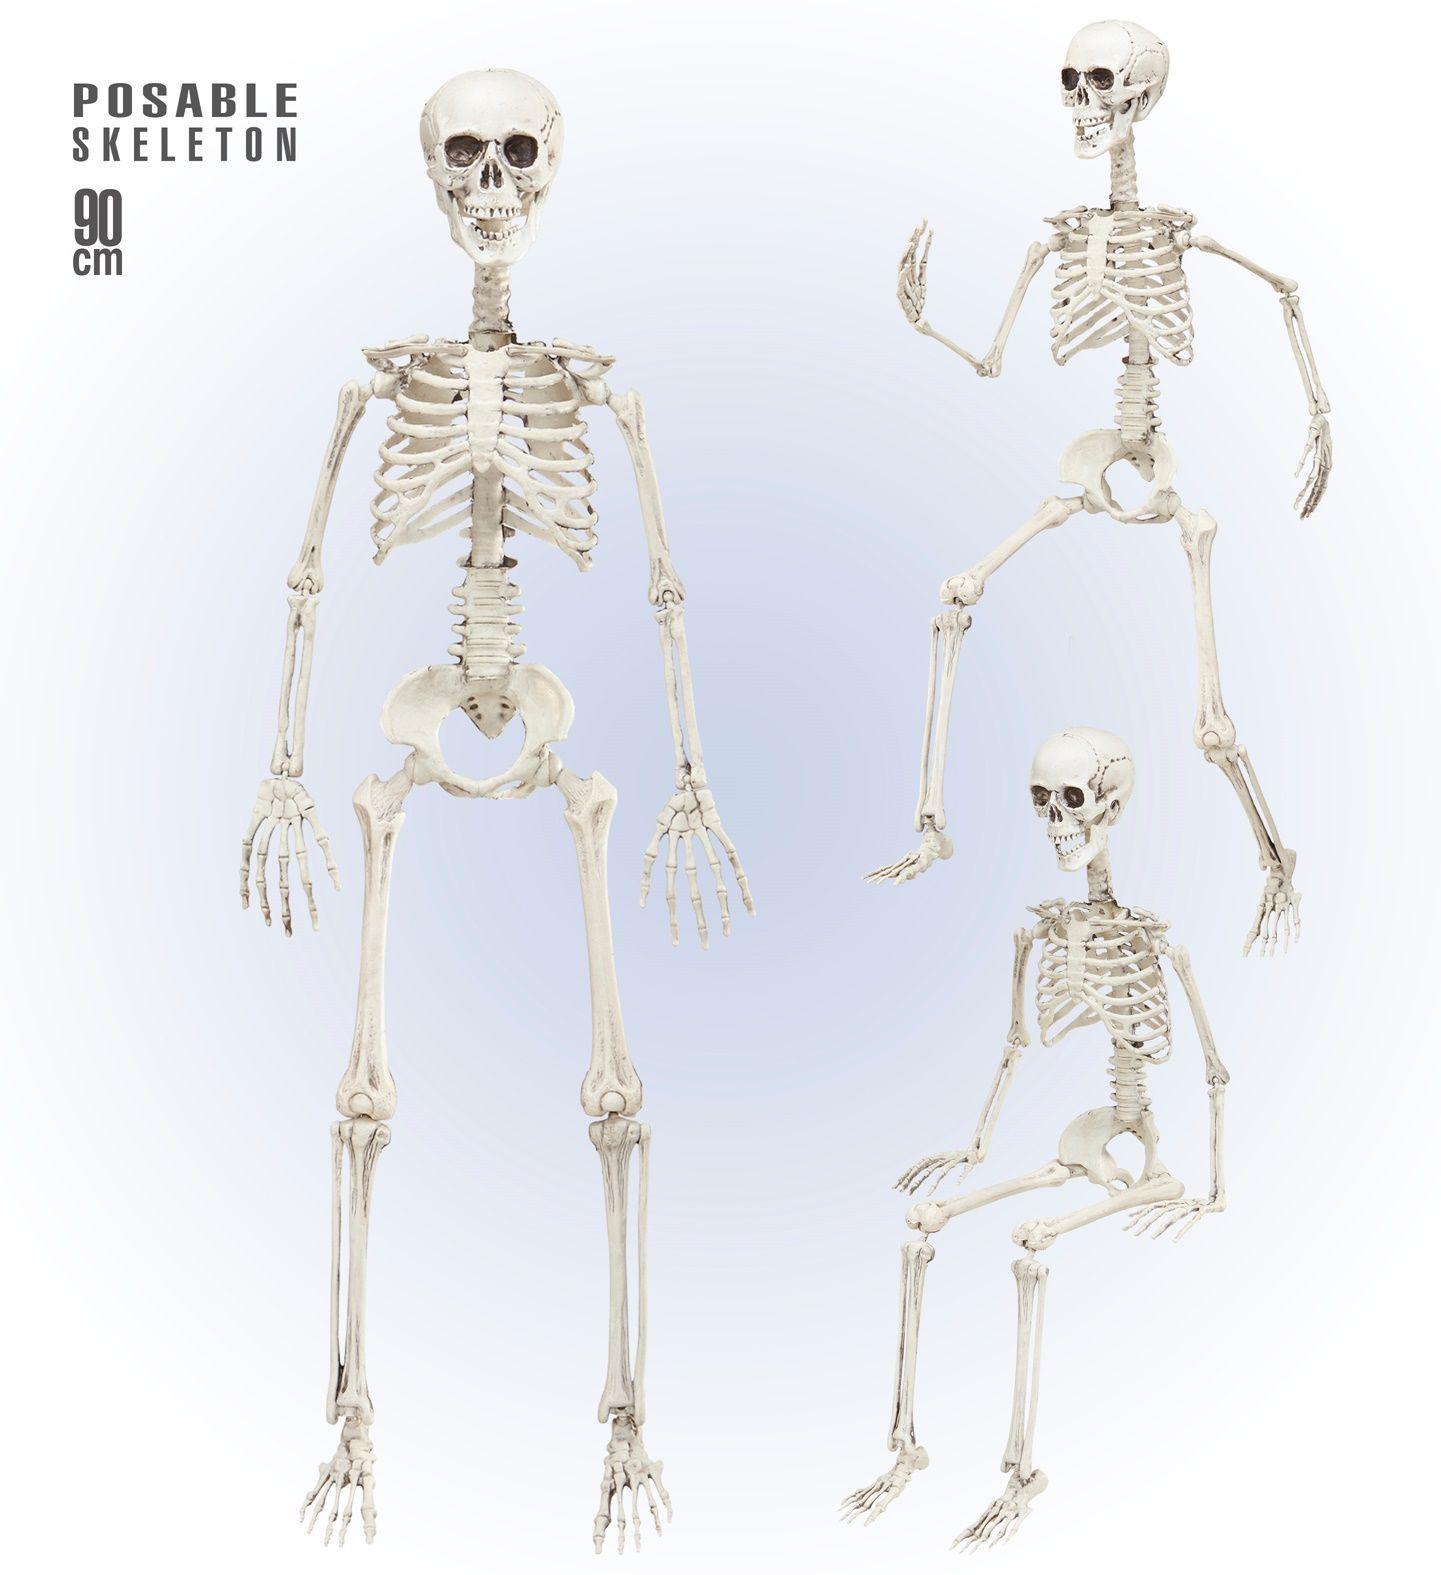 Poseerbare hangende skelet